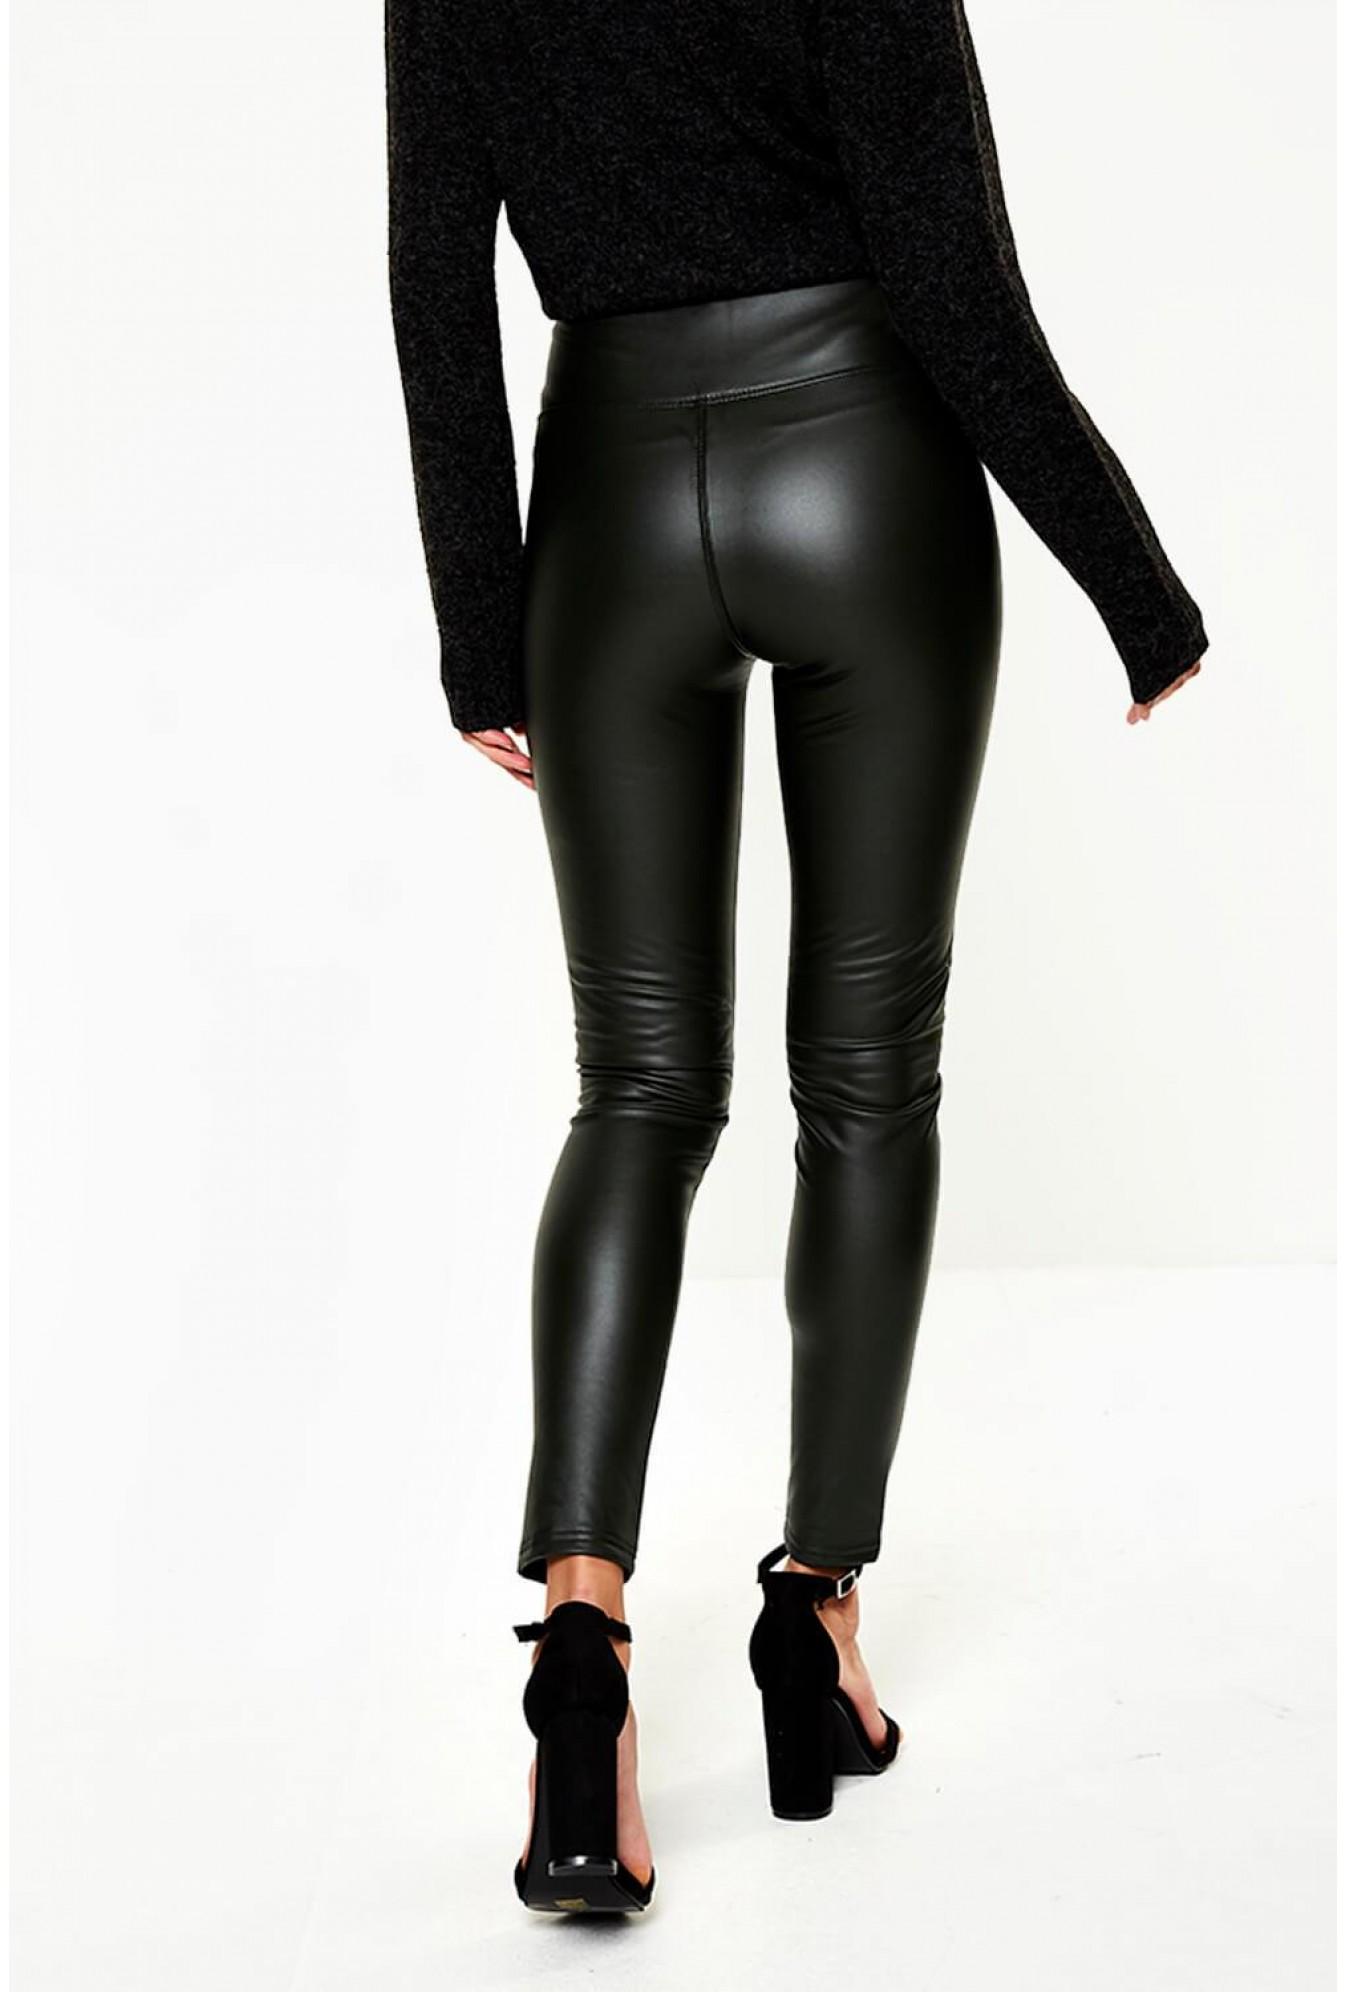 8d62f5b42 Yu Me Hana High Waist Fleece Lined Wet Look Leggings in Olive ...